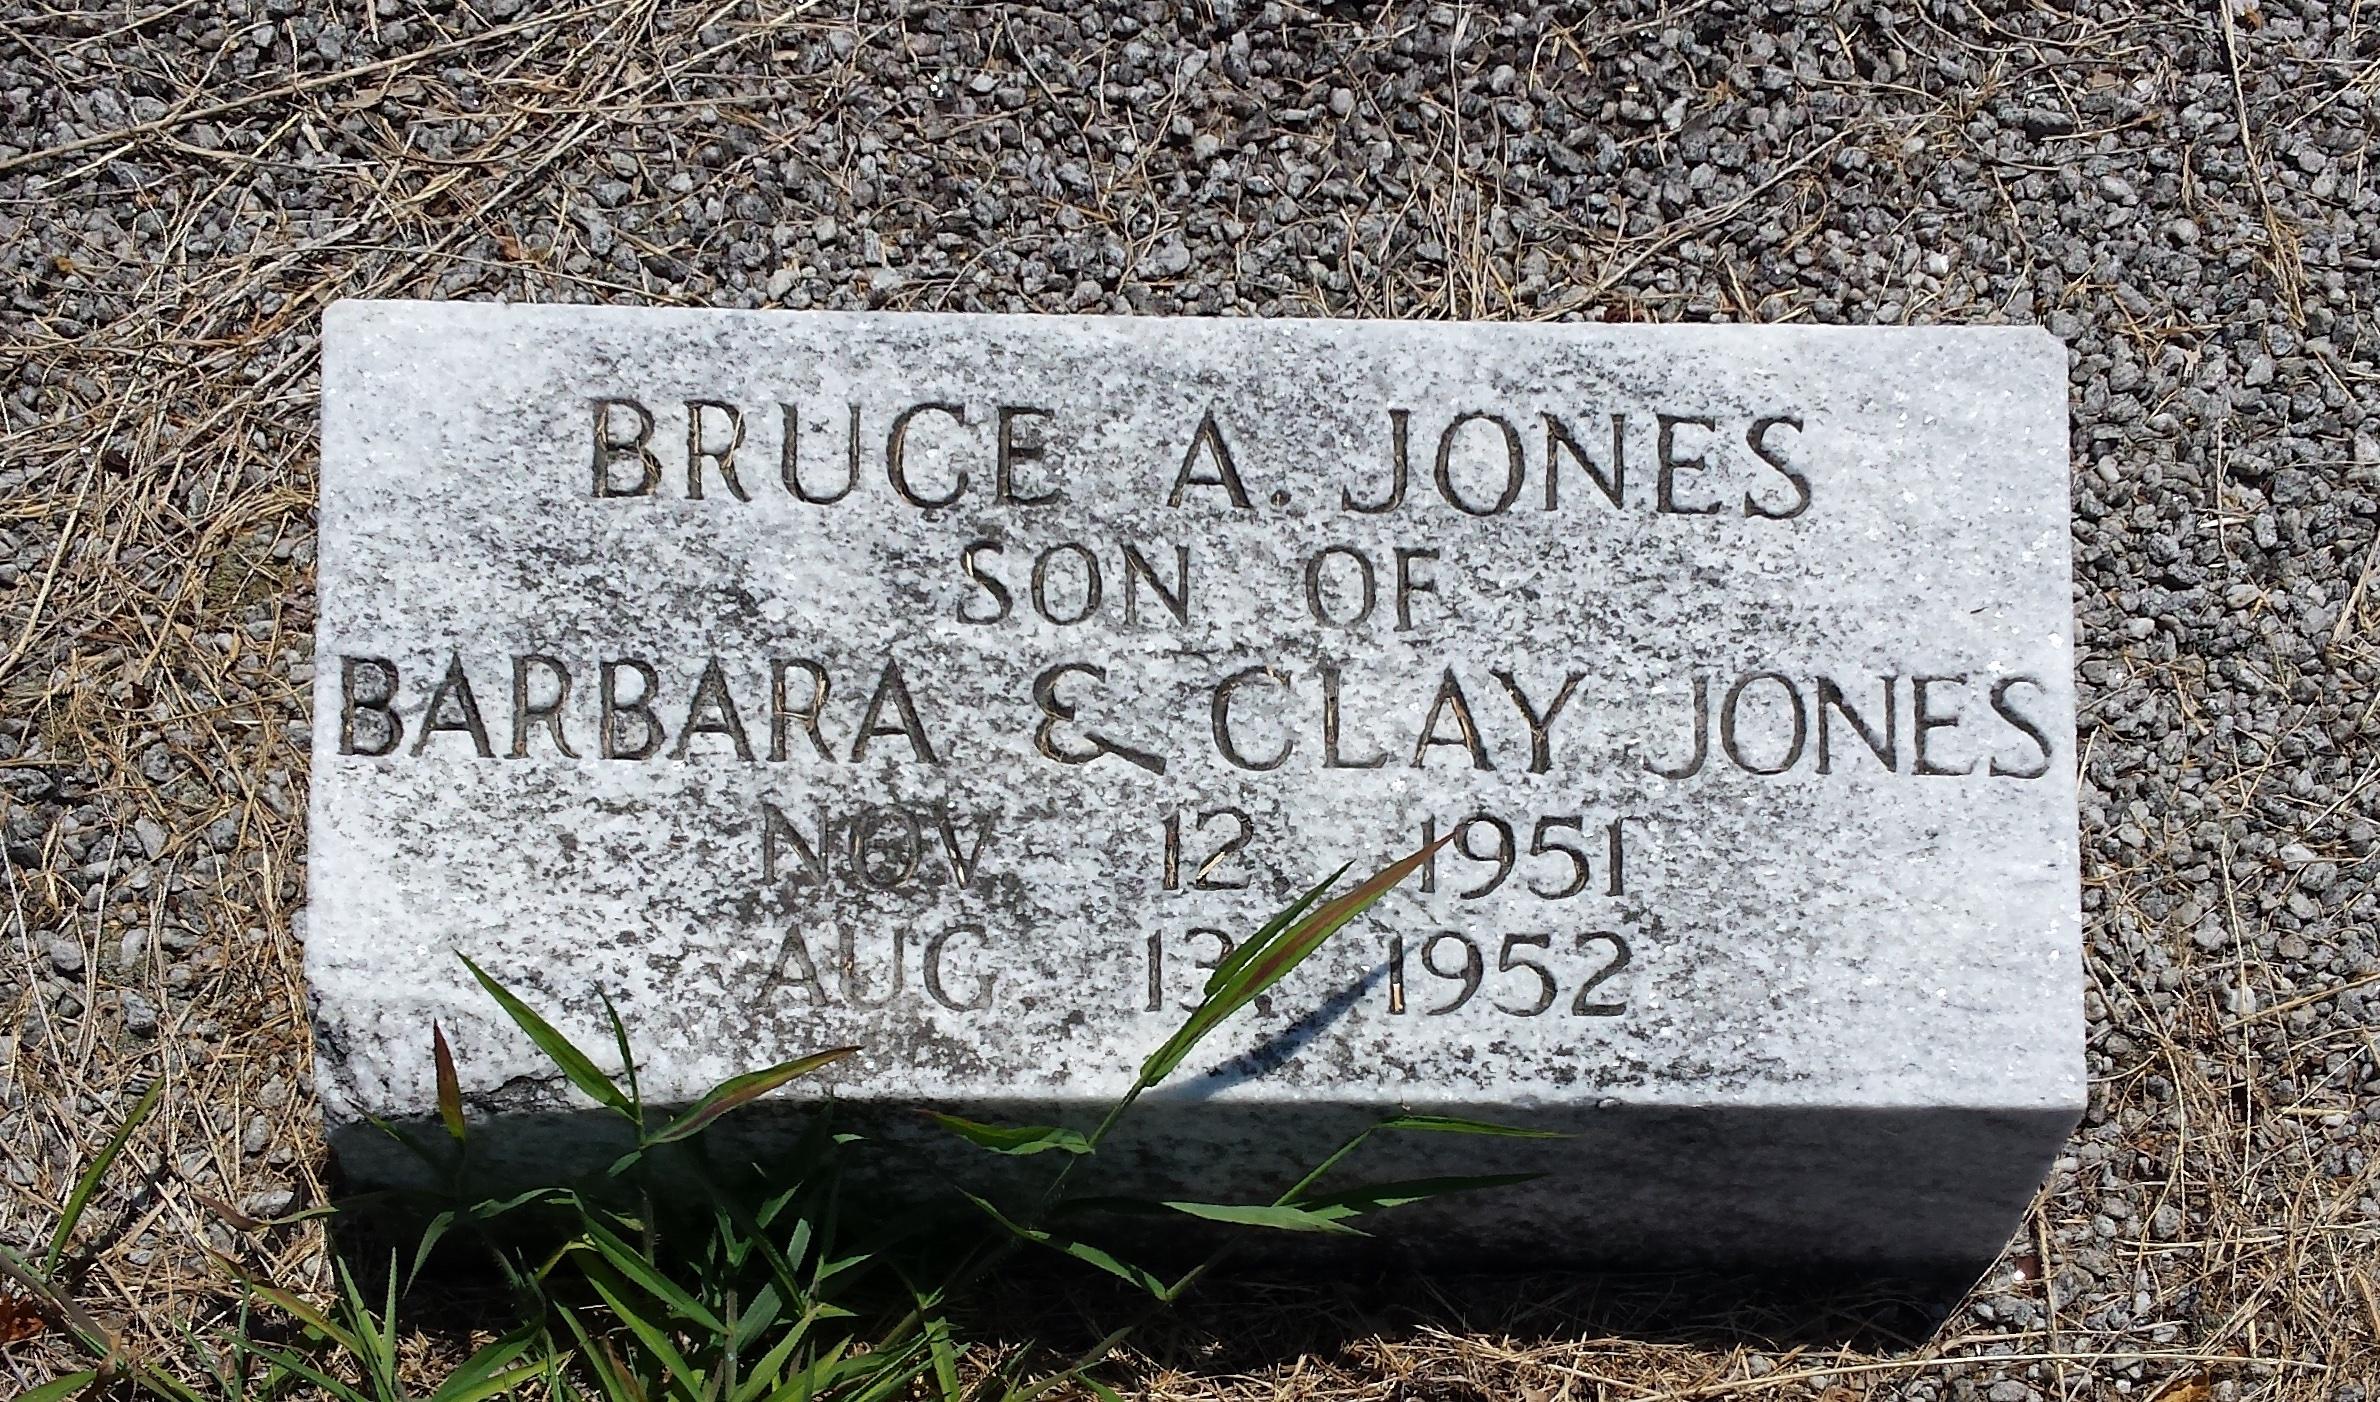 Bruce A. Jones